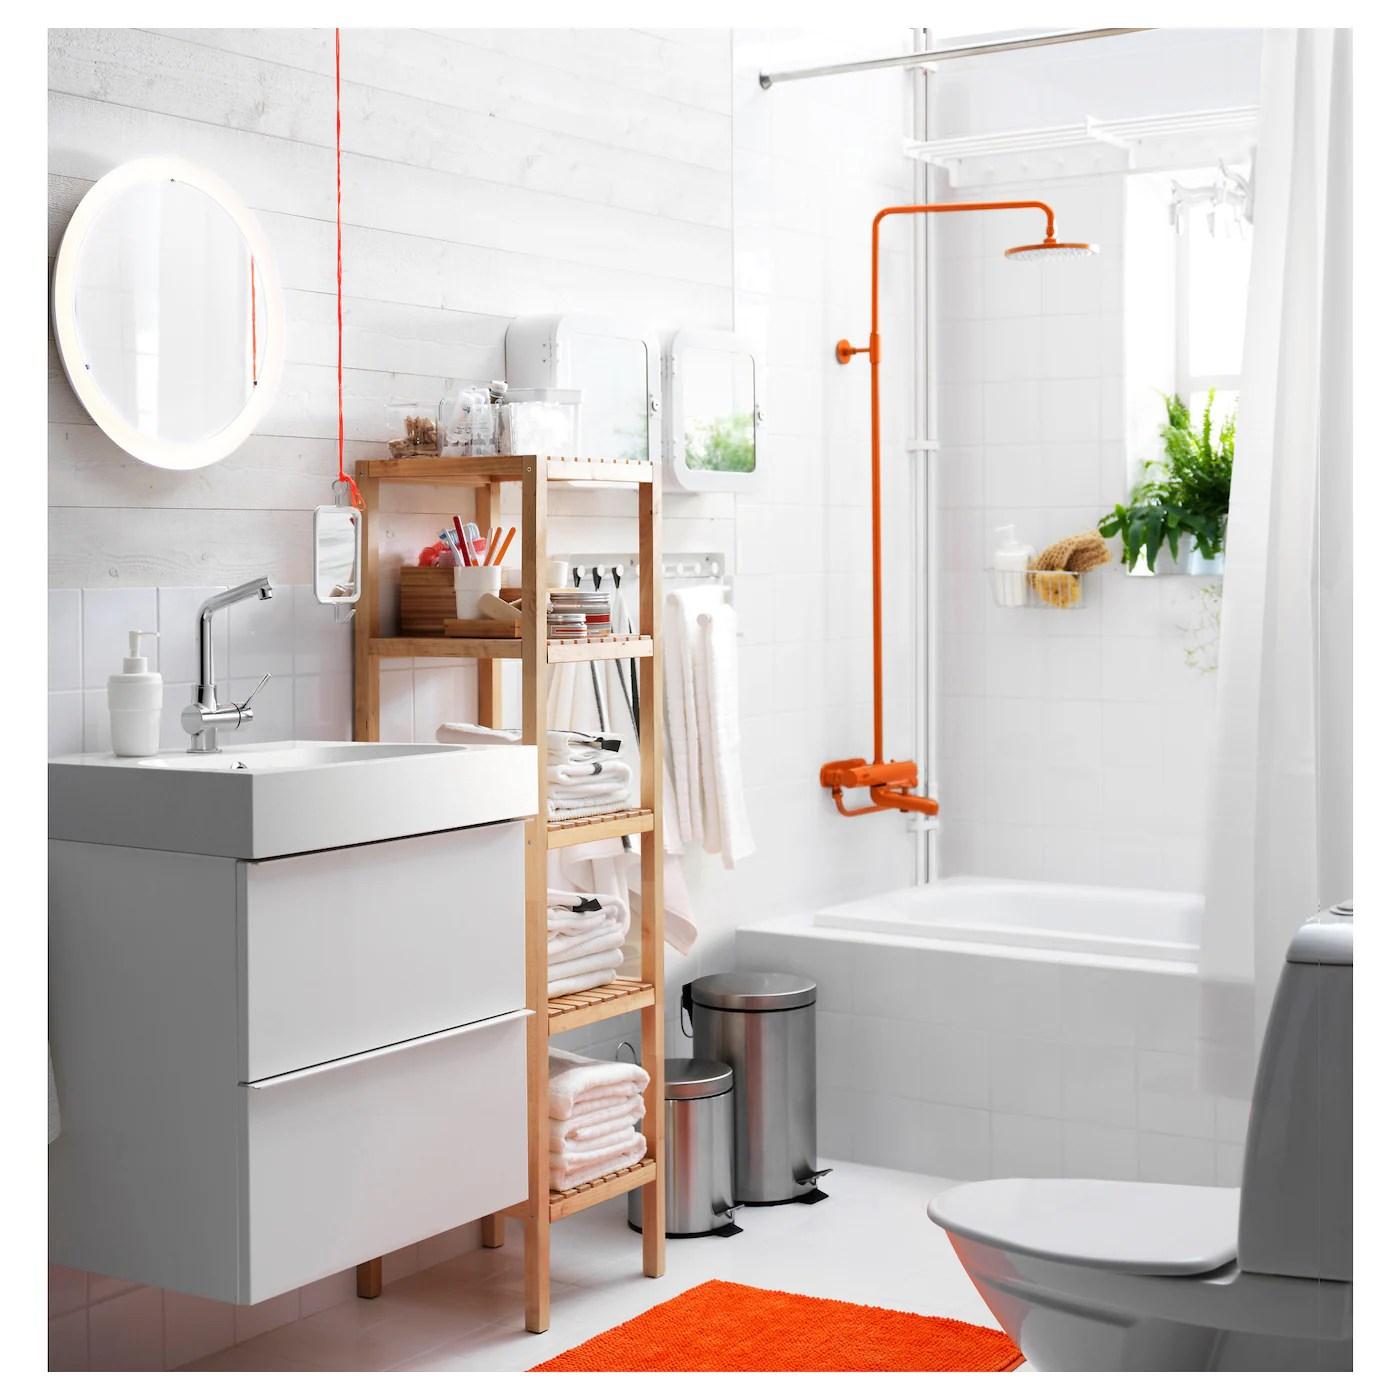 Storjorm Miroir Avec Eclairage Integre Blanc 47 Cm Ikea